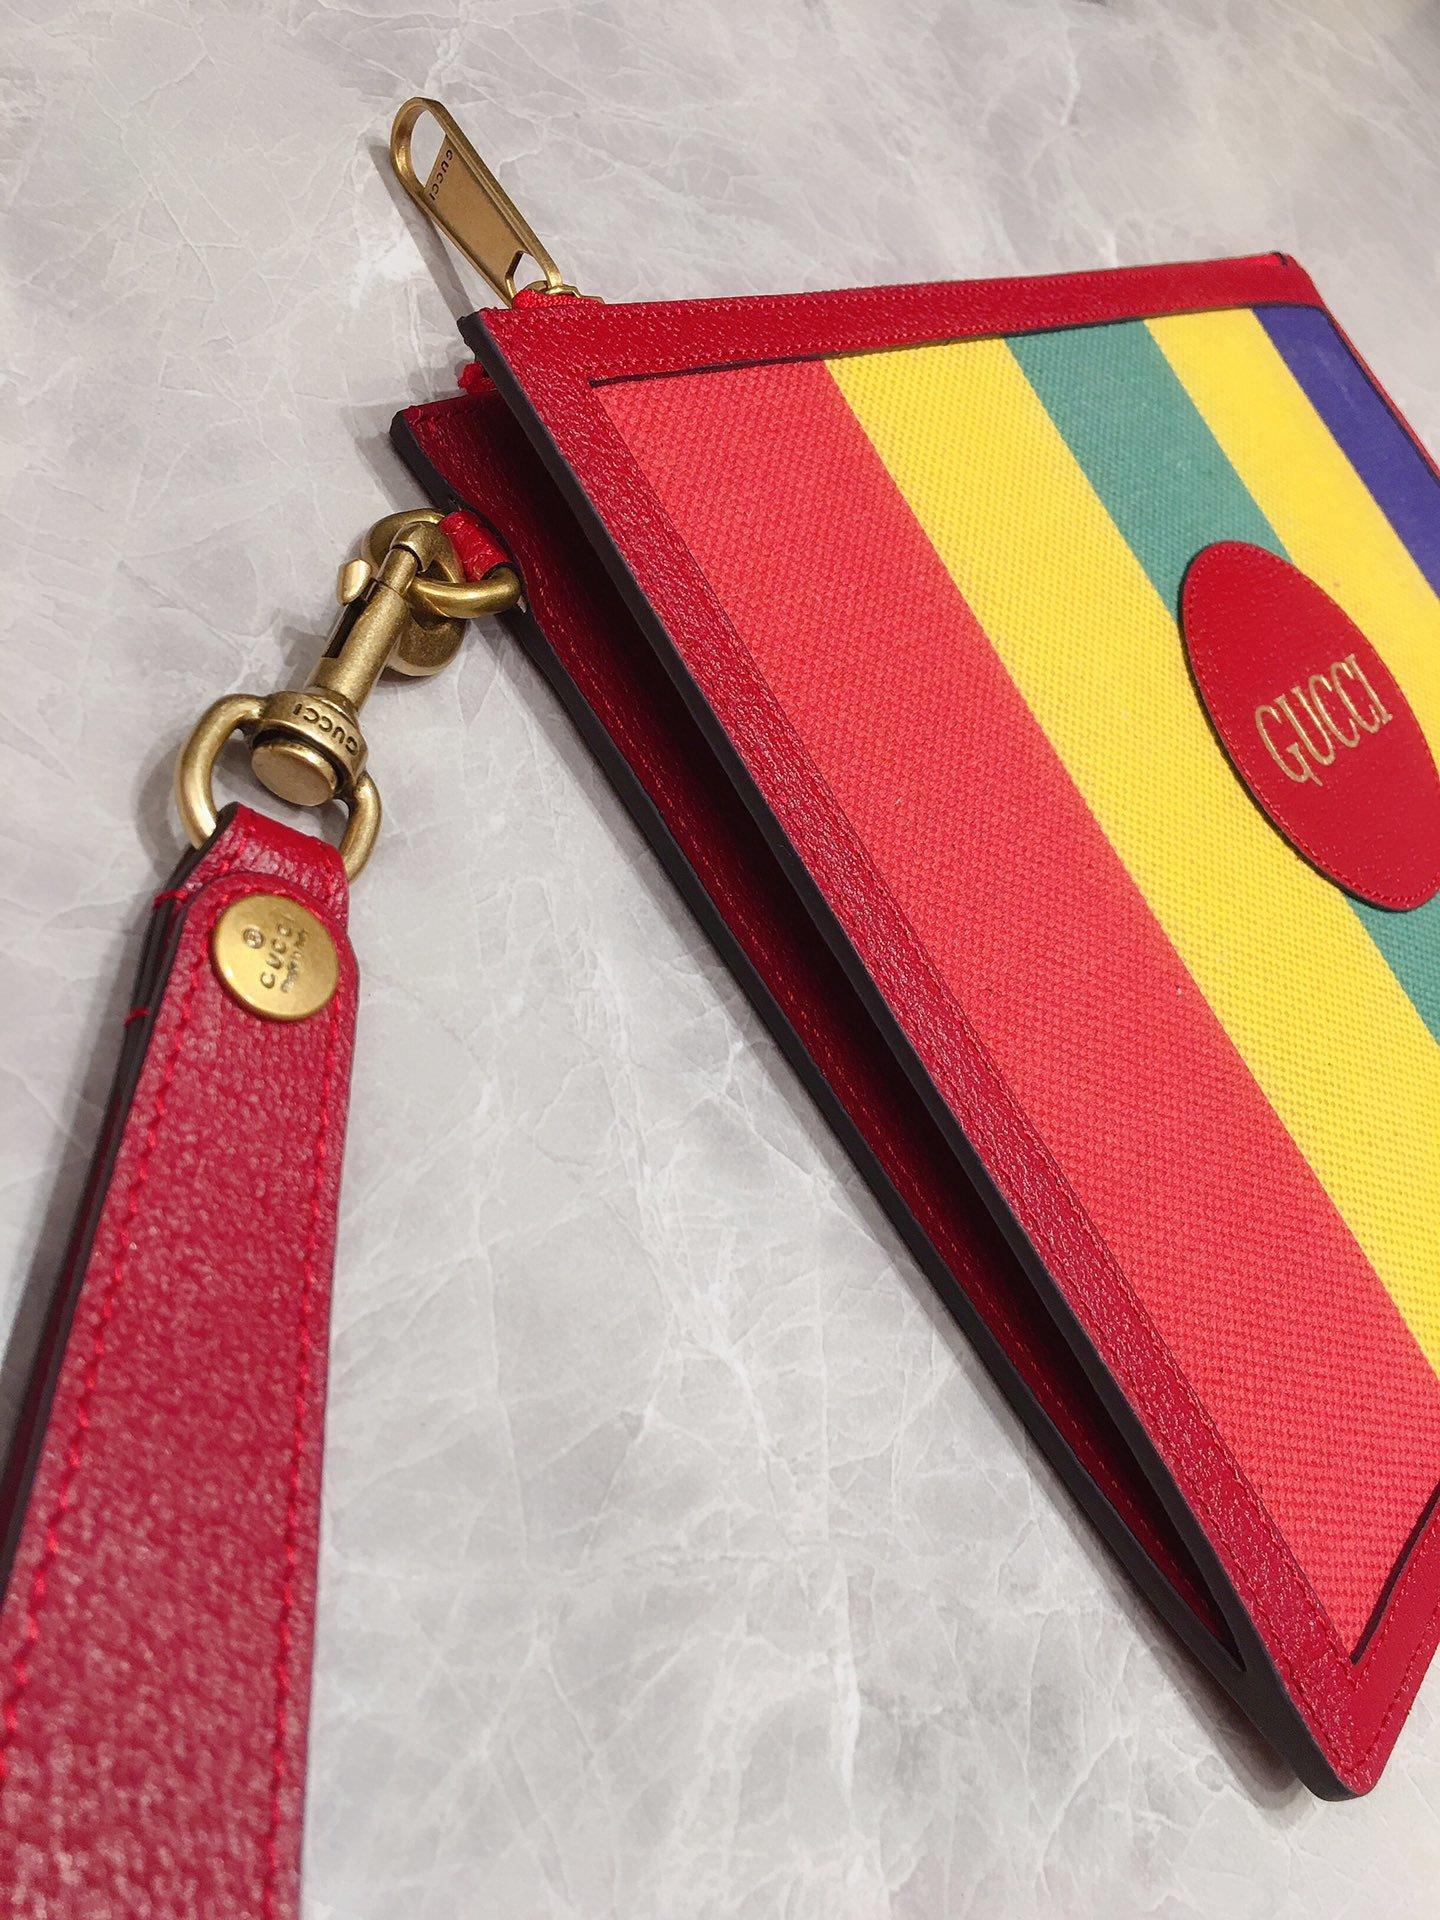 Gucci专柜同步上新 原单出品 Baiadera宽条纹帆布手拿包 (图7)